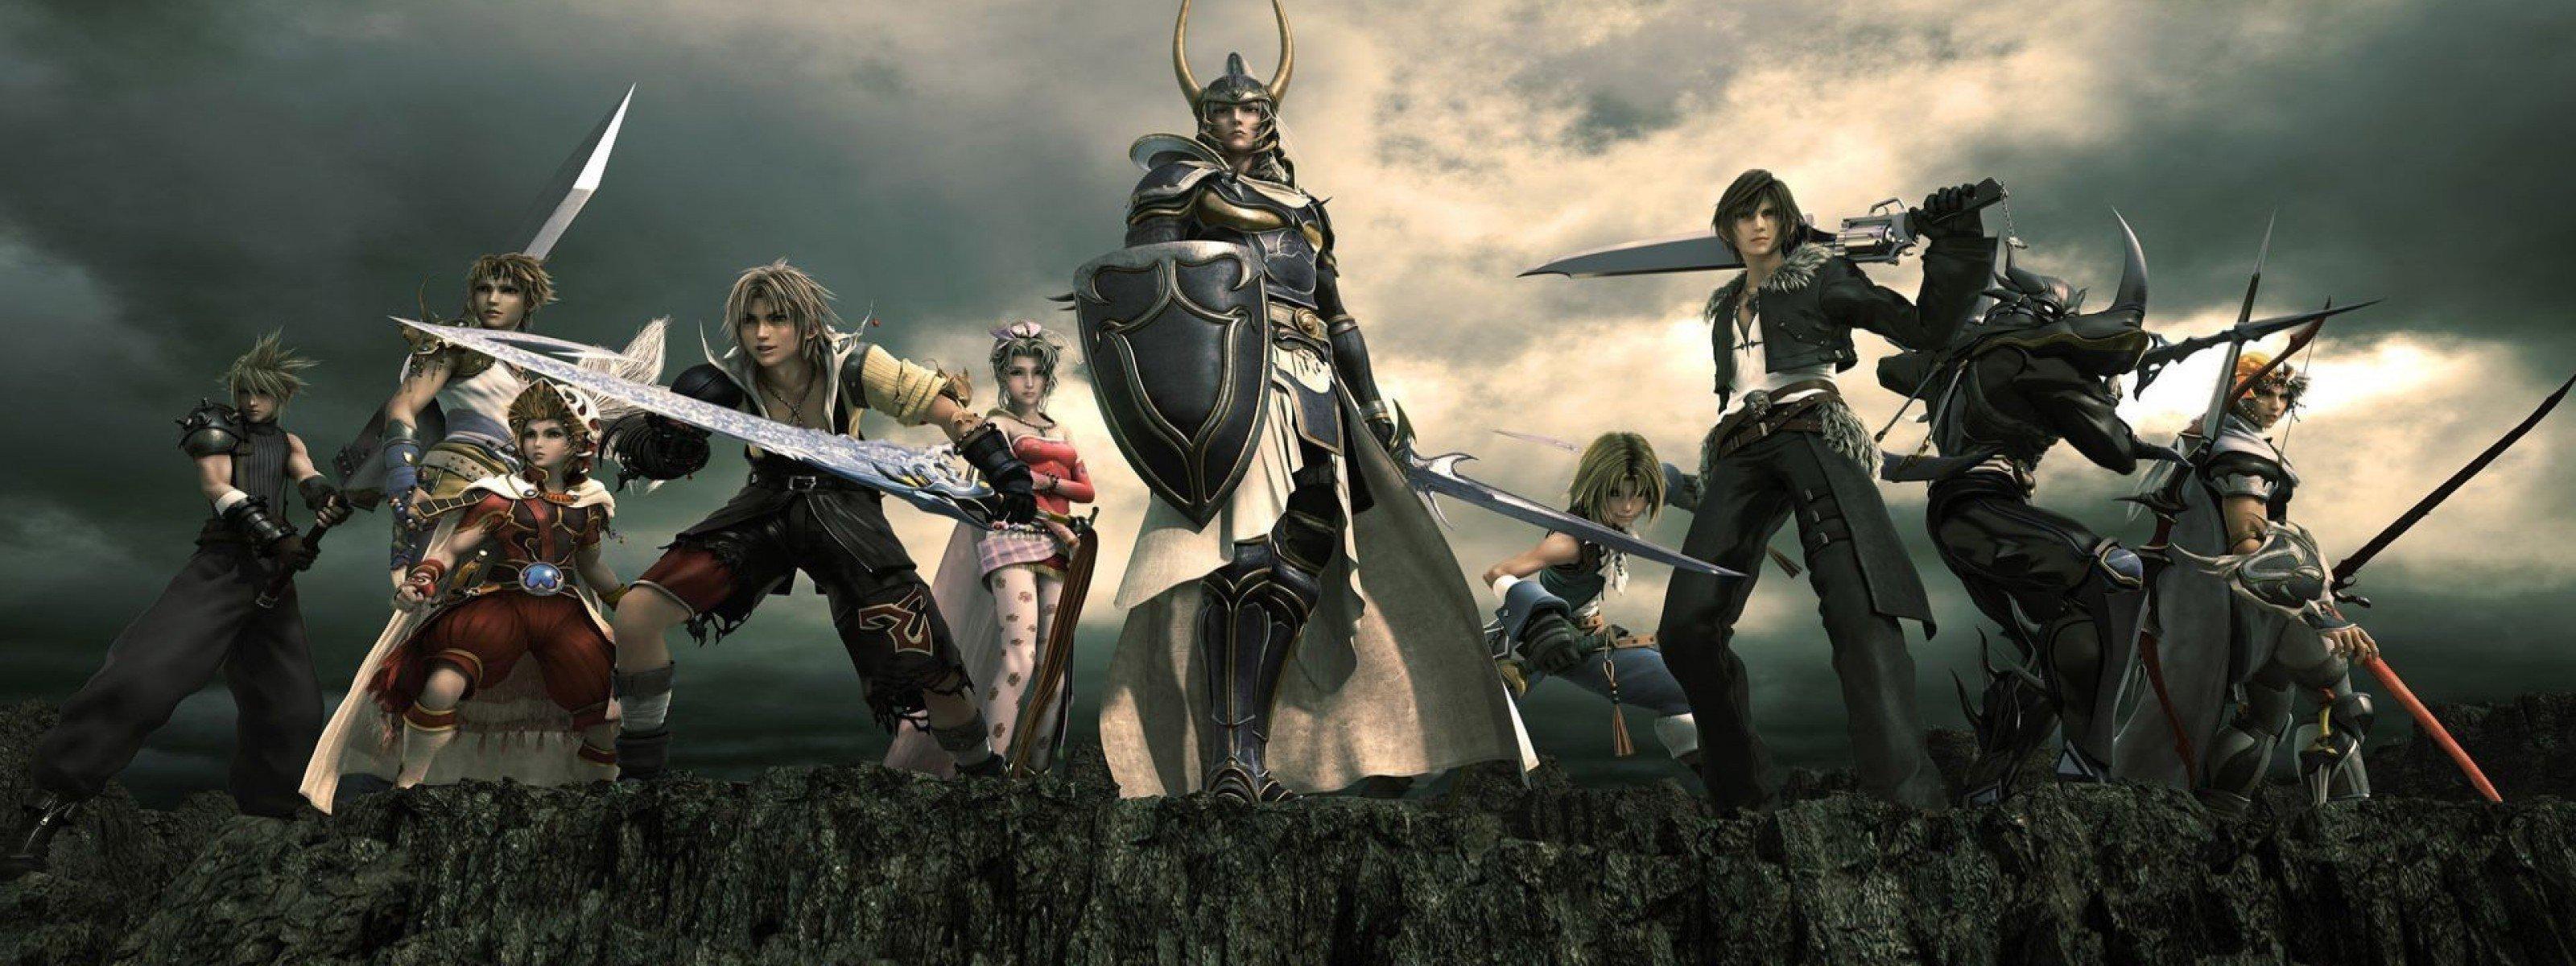 Final Fantasy Action Rpg Fighting Fantasy Combat Battle Warrior